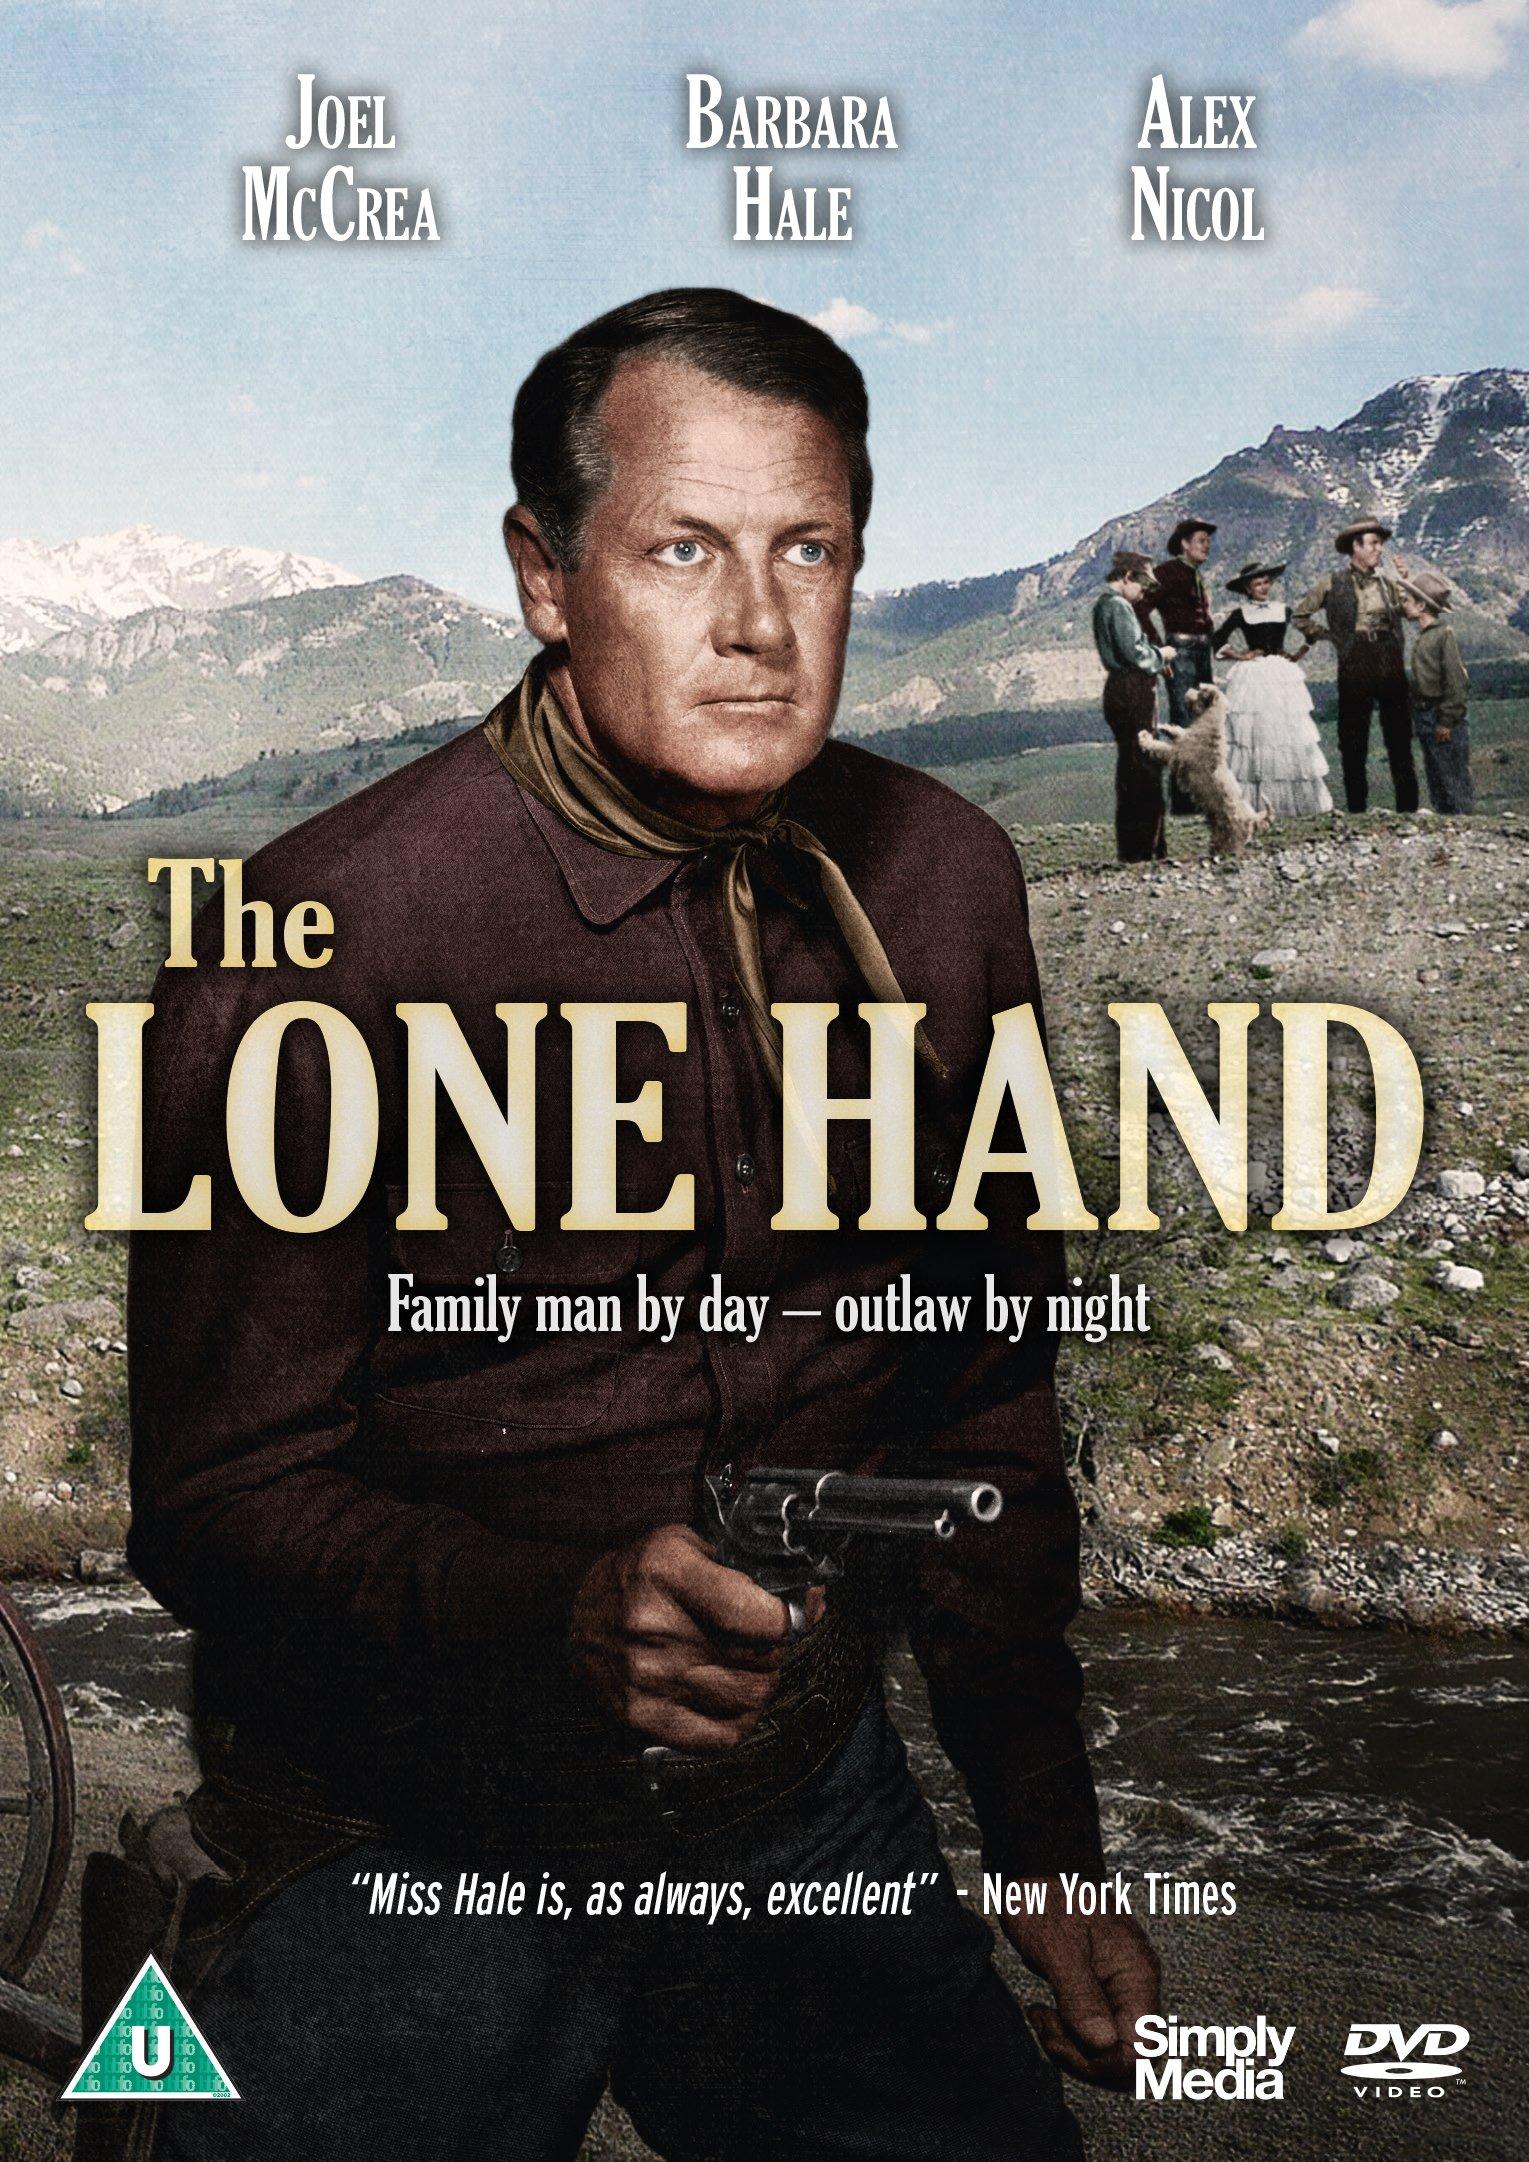 Barbara Hale, Jimmy Hunt, Joel McCrea, and Wesley Morgan in The Lone Hand (1953)